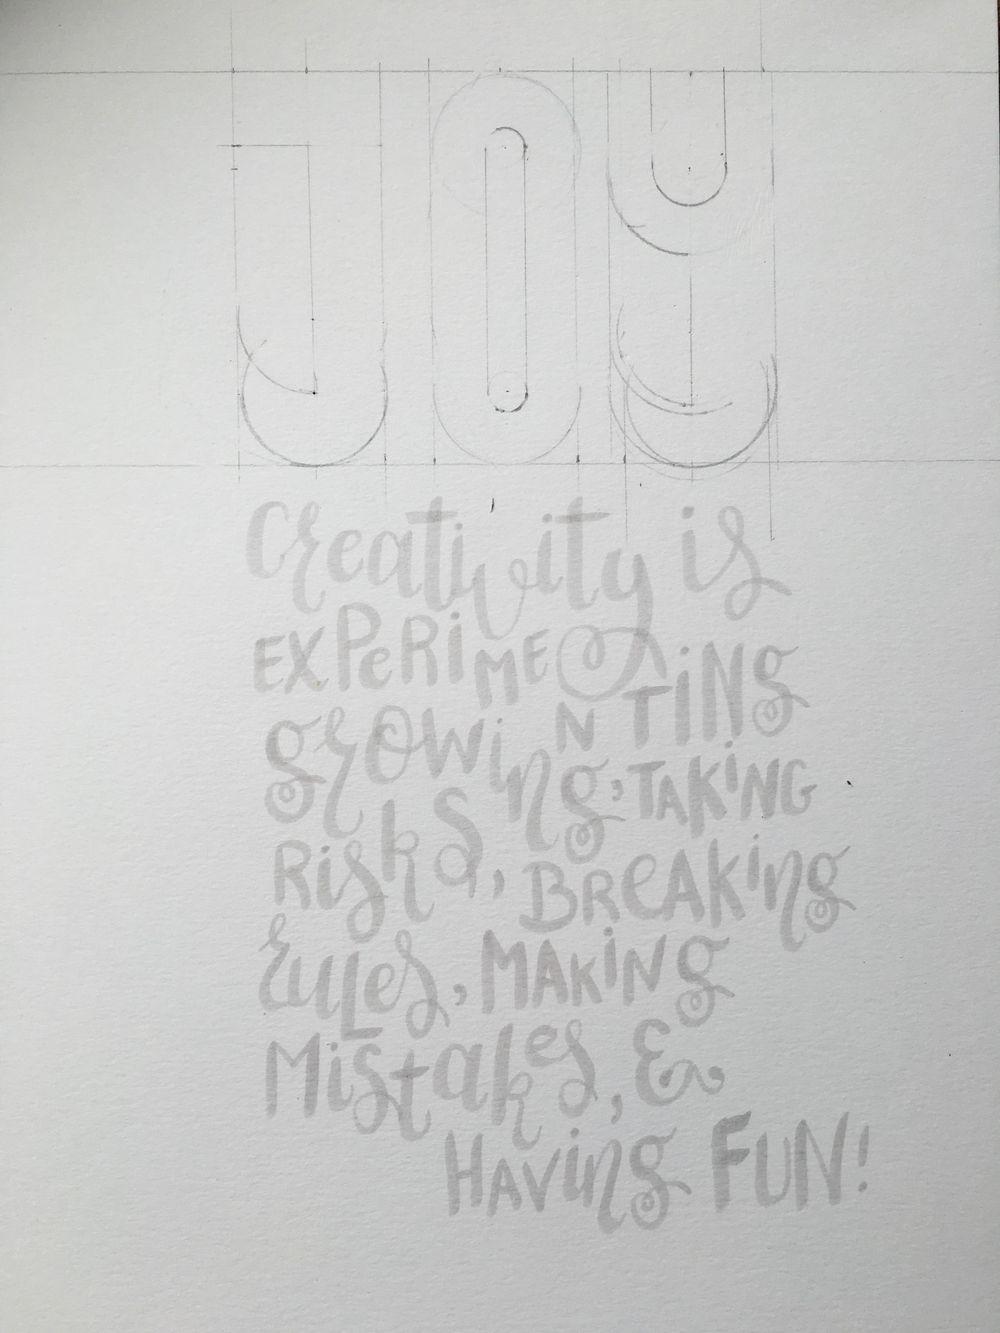 Joy! - image 2 - student project